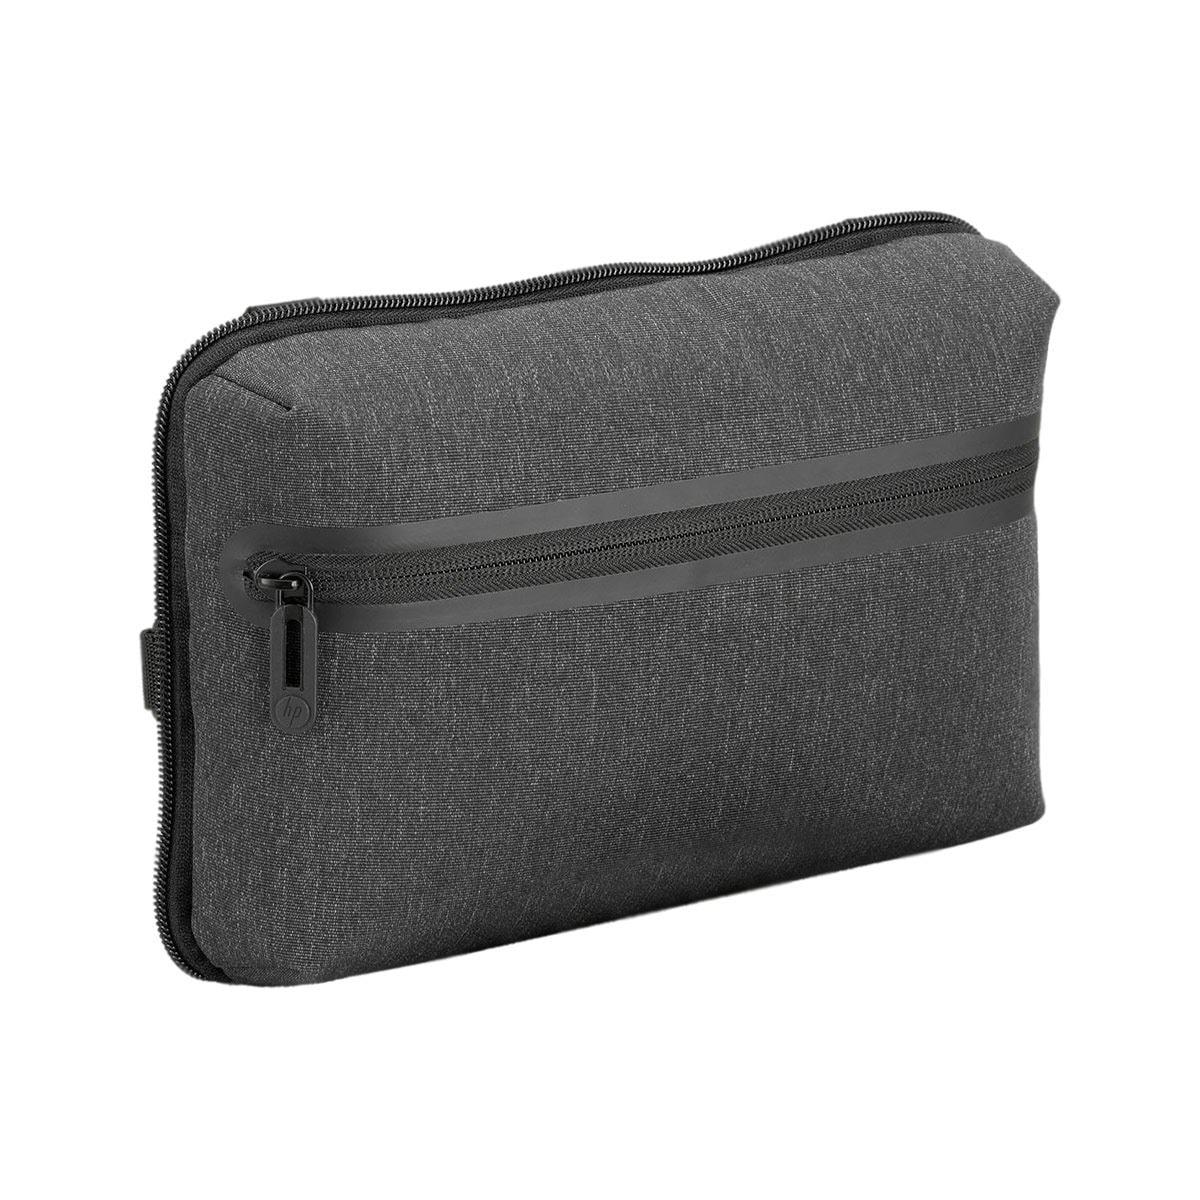 "Mochila Portalaptop 15.6"" 3 en 1 Mod. USB Travel Gris HP"